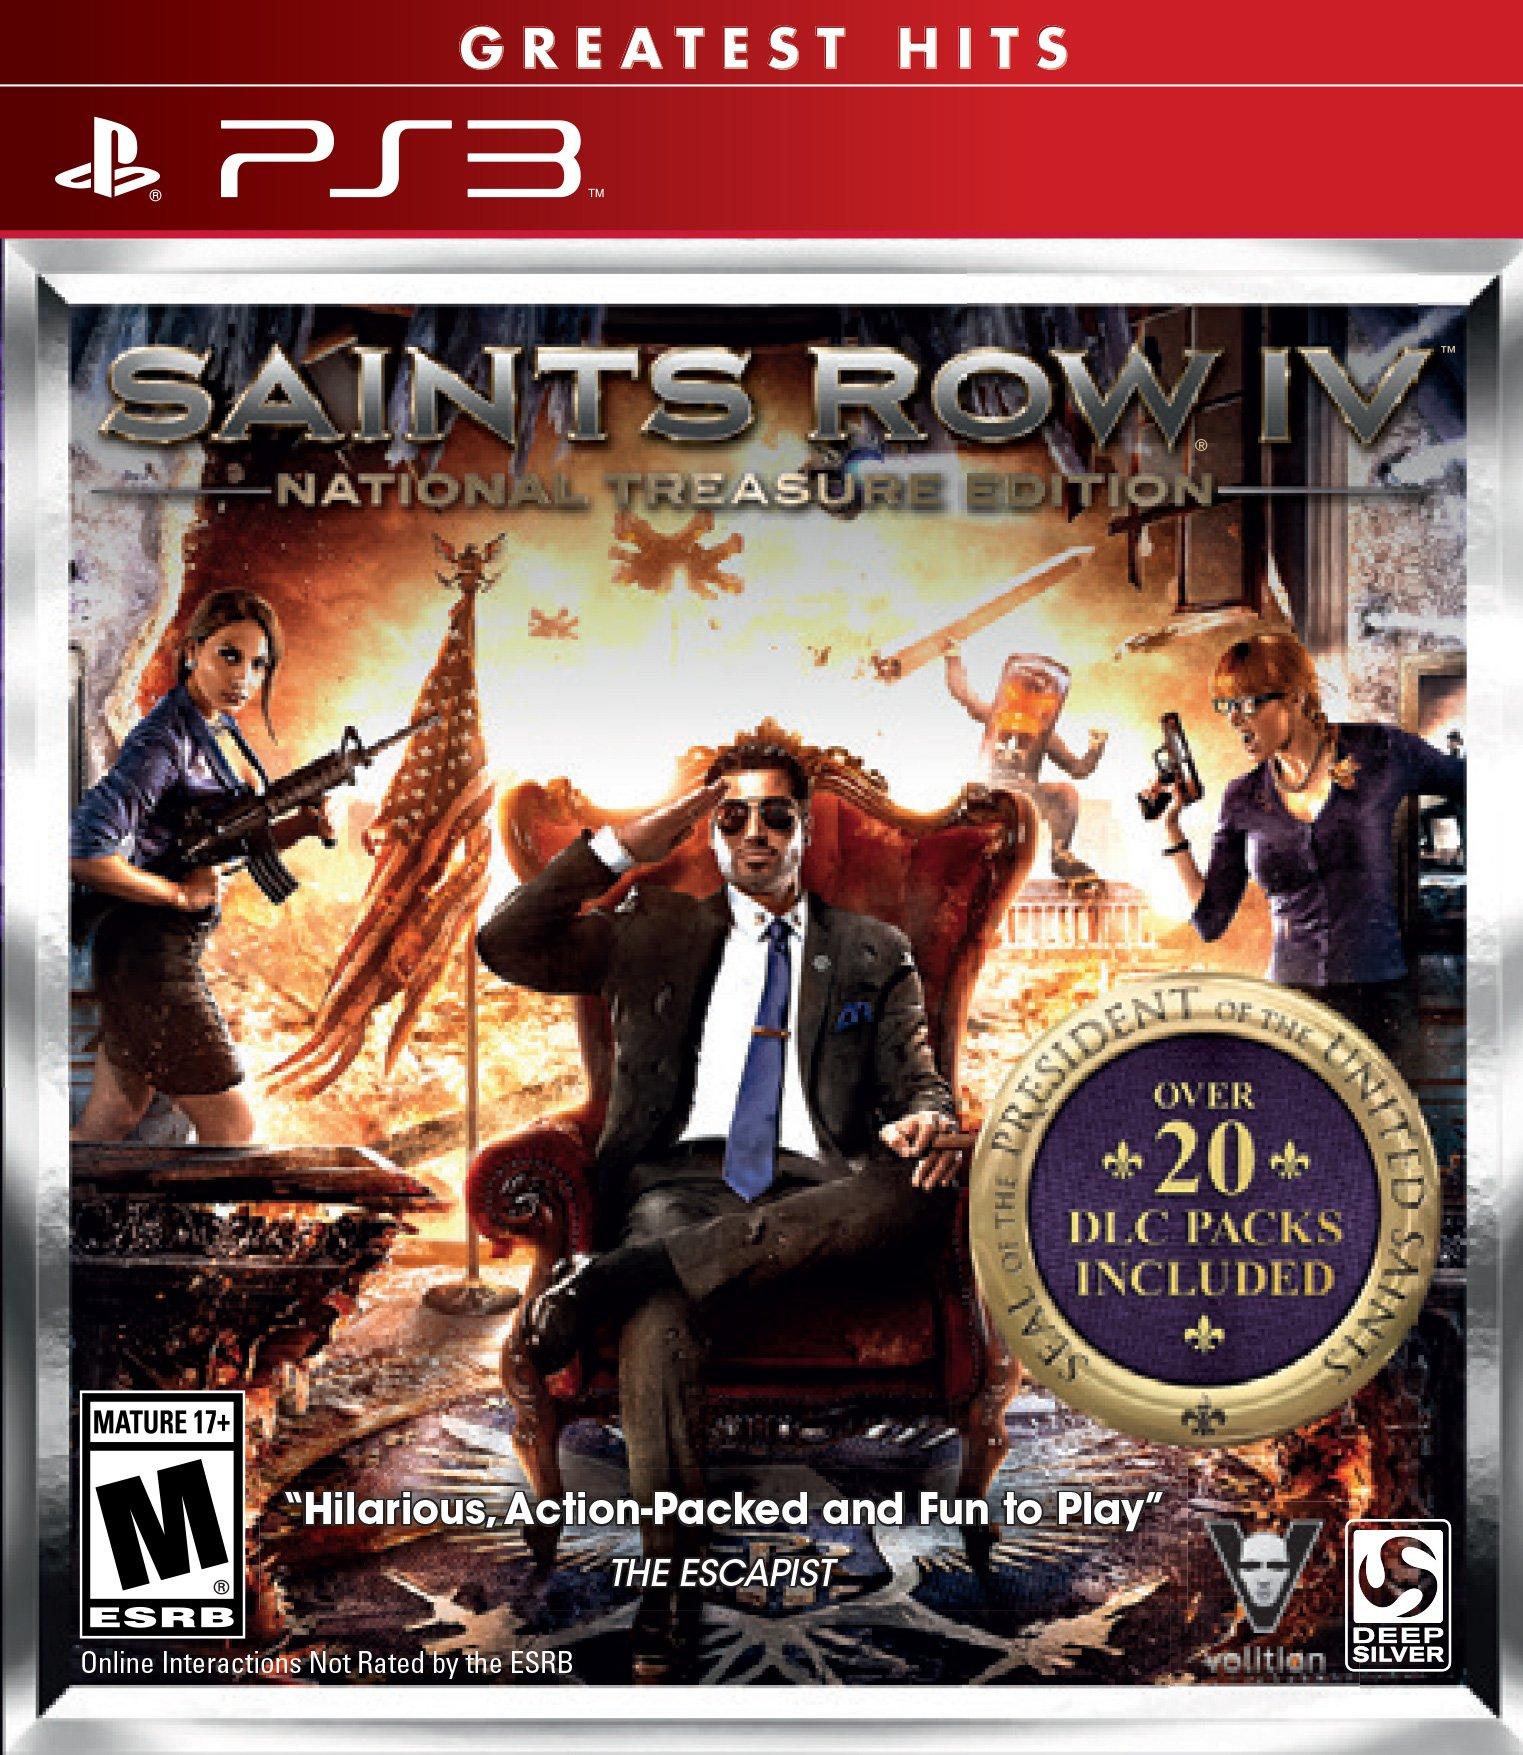 Saints Row IV: National Treasure Edition